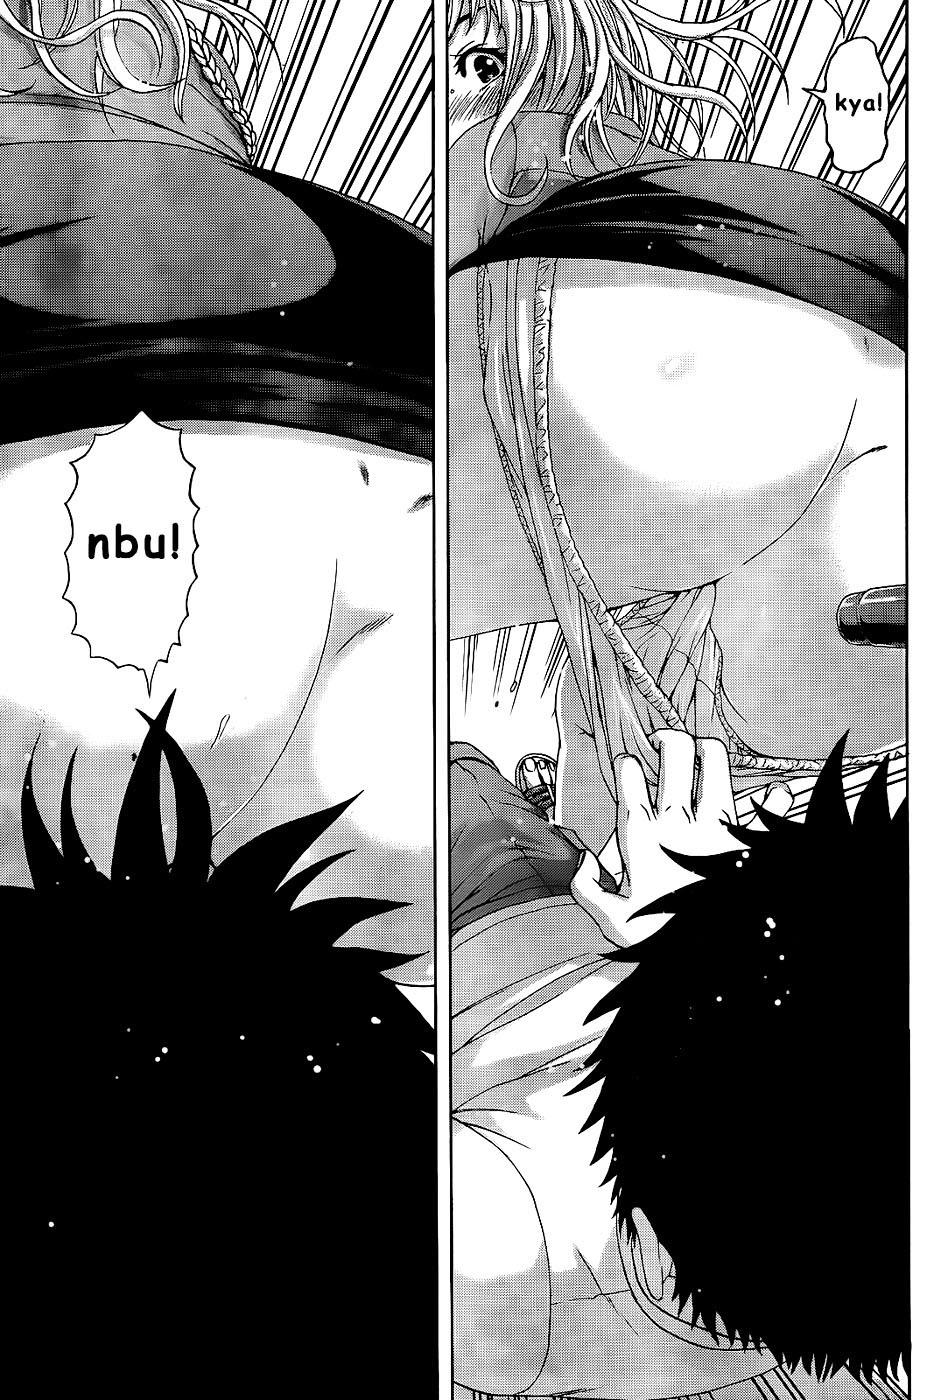 Hình ảnh Mujaki%2Bno%2Brakuen%2B %2Bchap%2B50018 in [Siêu phẩm] Mujaki no Rakuen Hentai Series